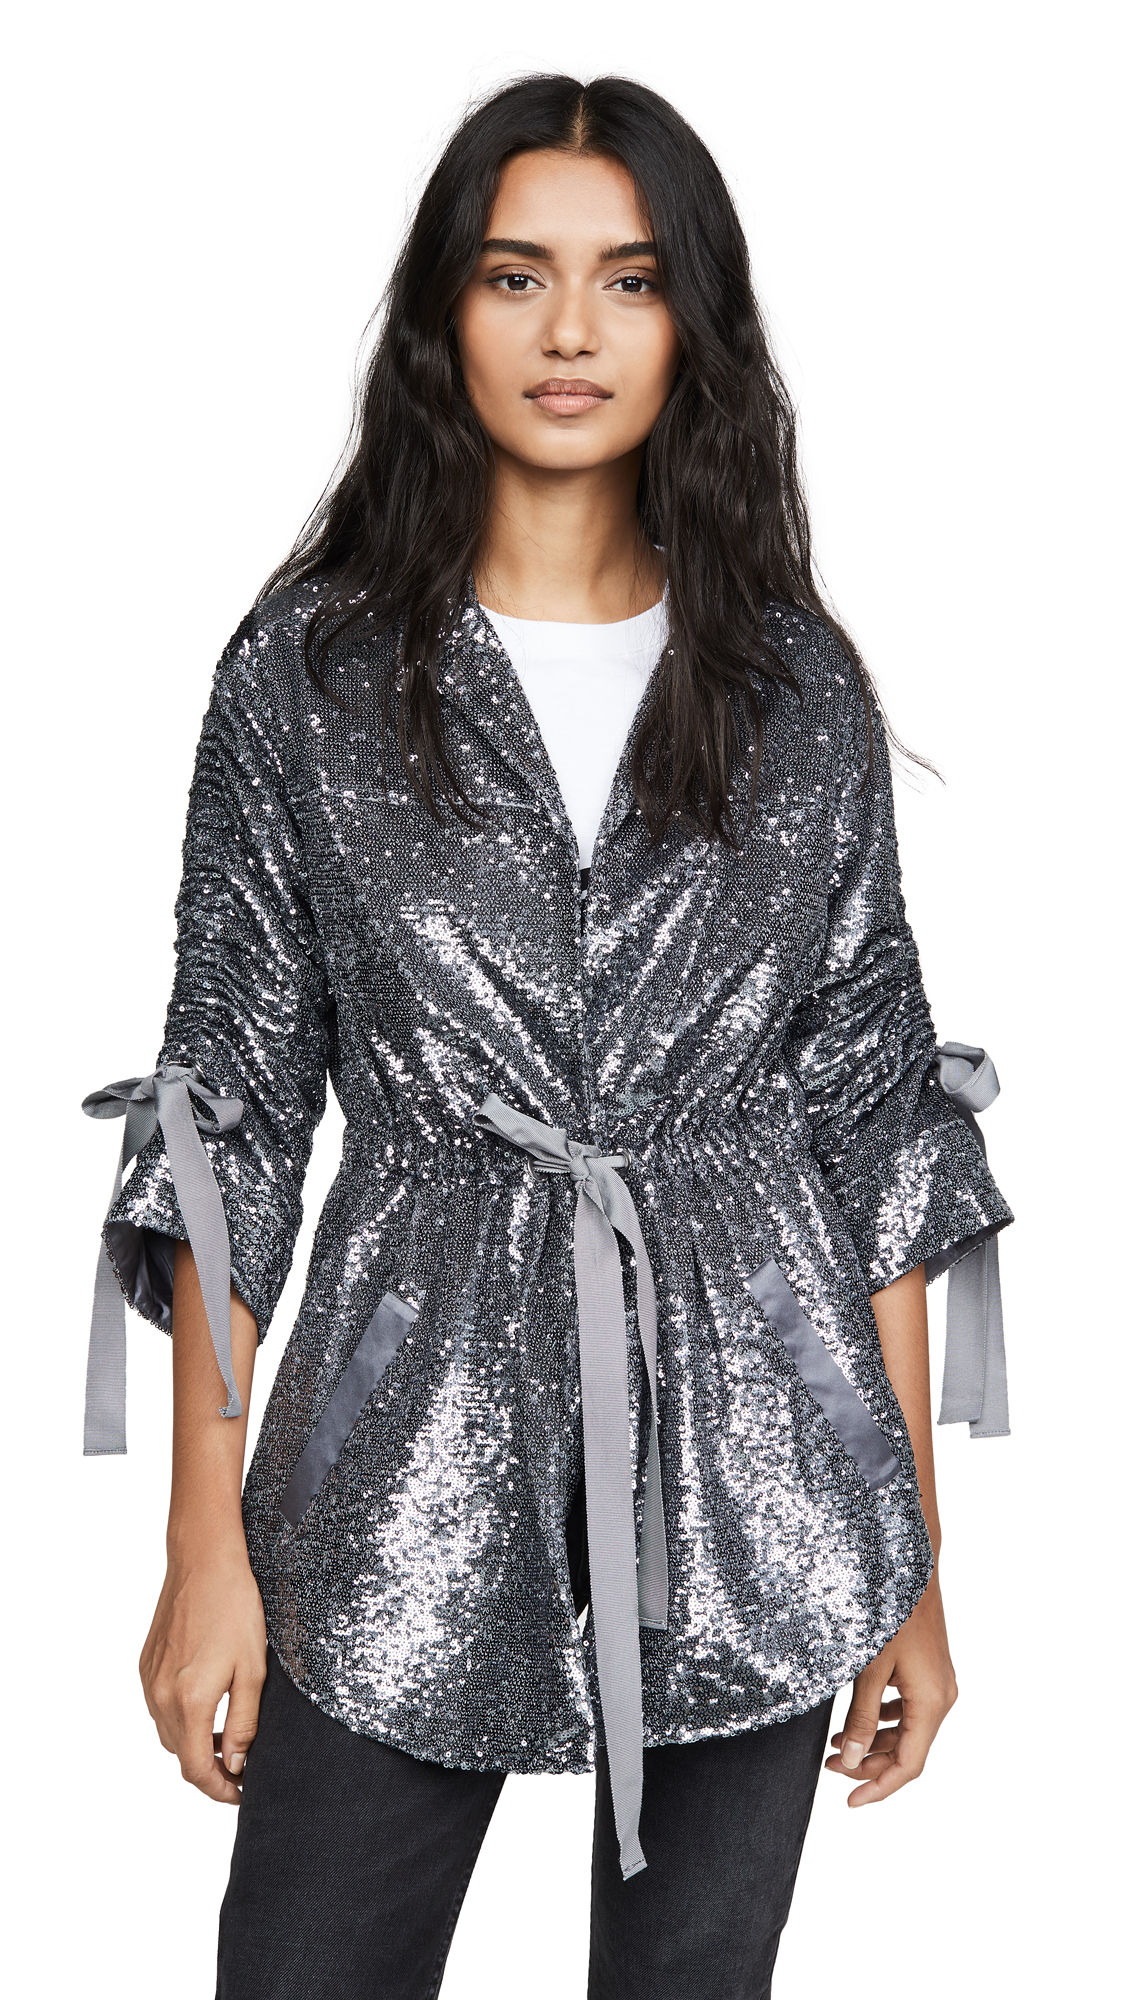 Buy Cinq a Sept Sequin Mathieu Jacket online beautiful Cinq a Sept Jackets, Coats, Coats